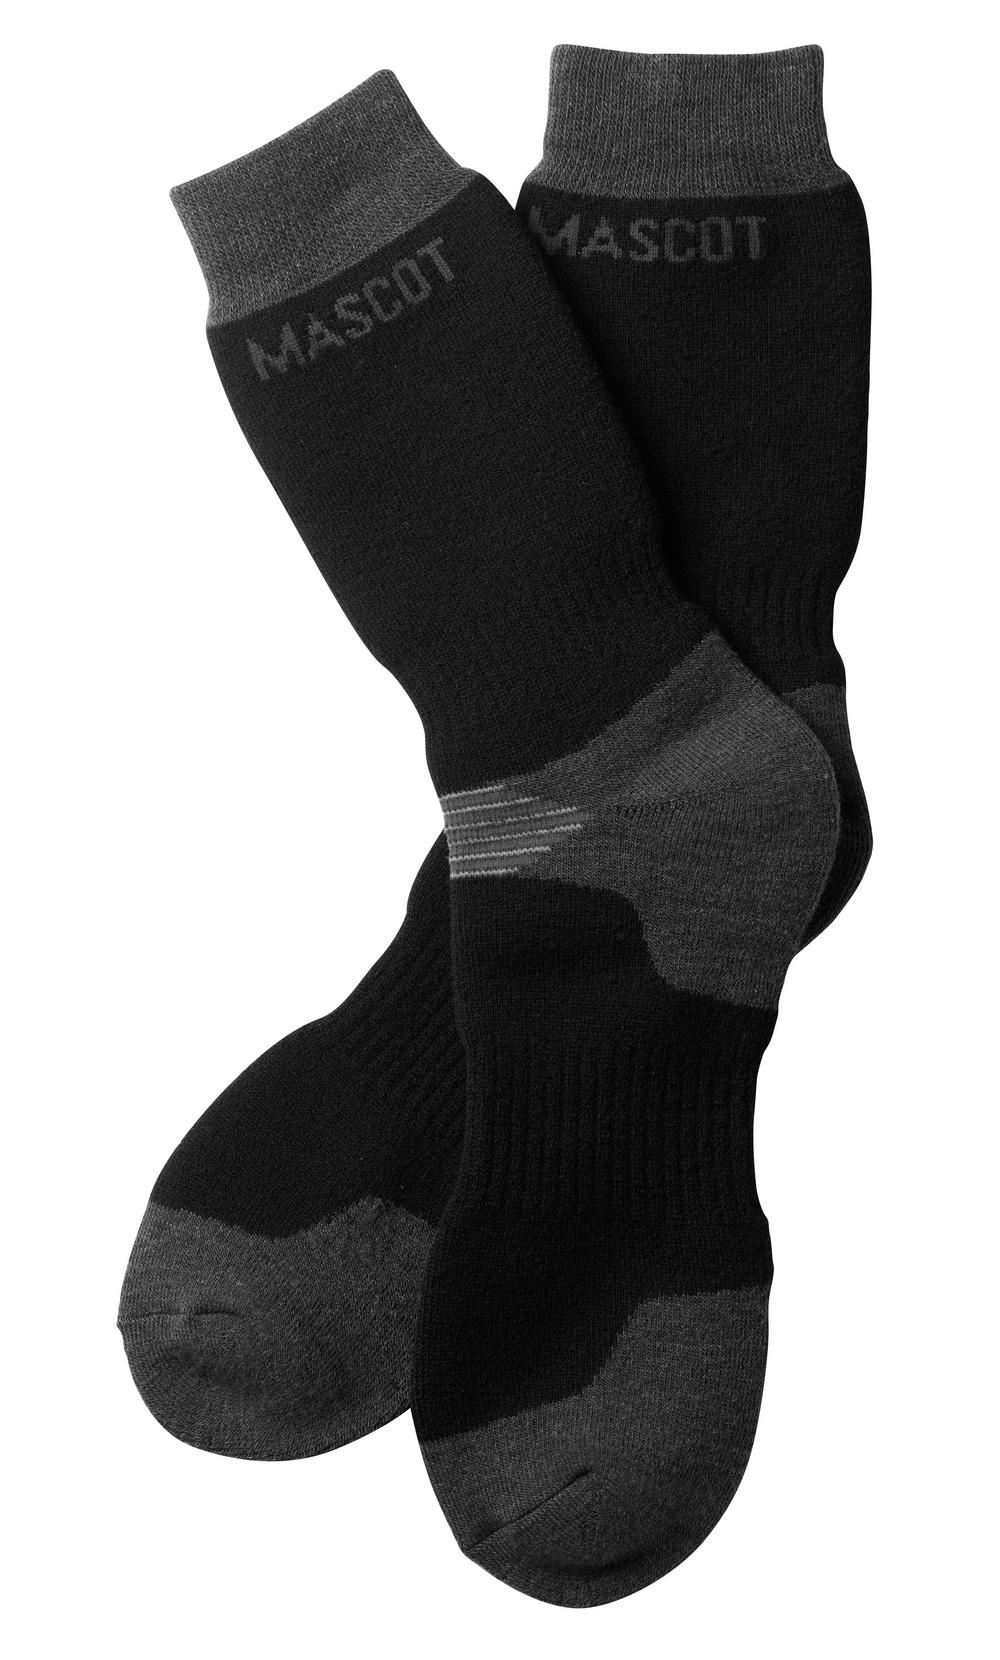 50404-876-0918 Socken - Schwarz/Dunkelanthrazit